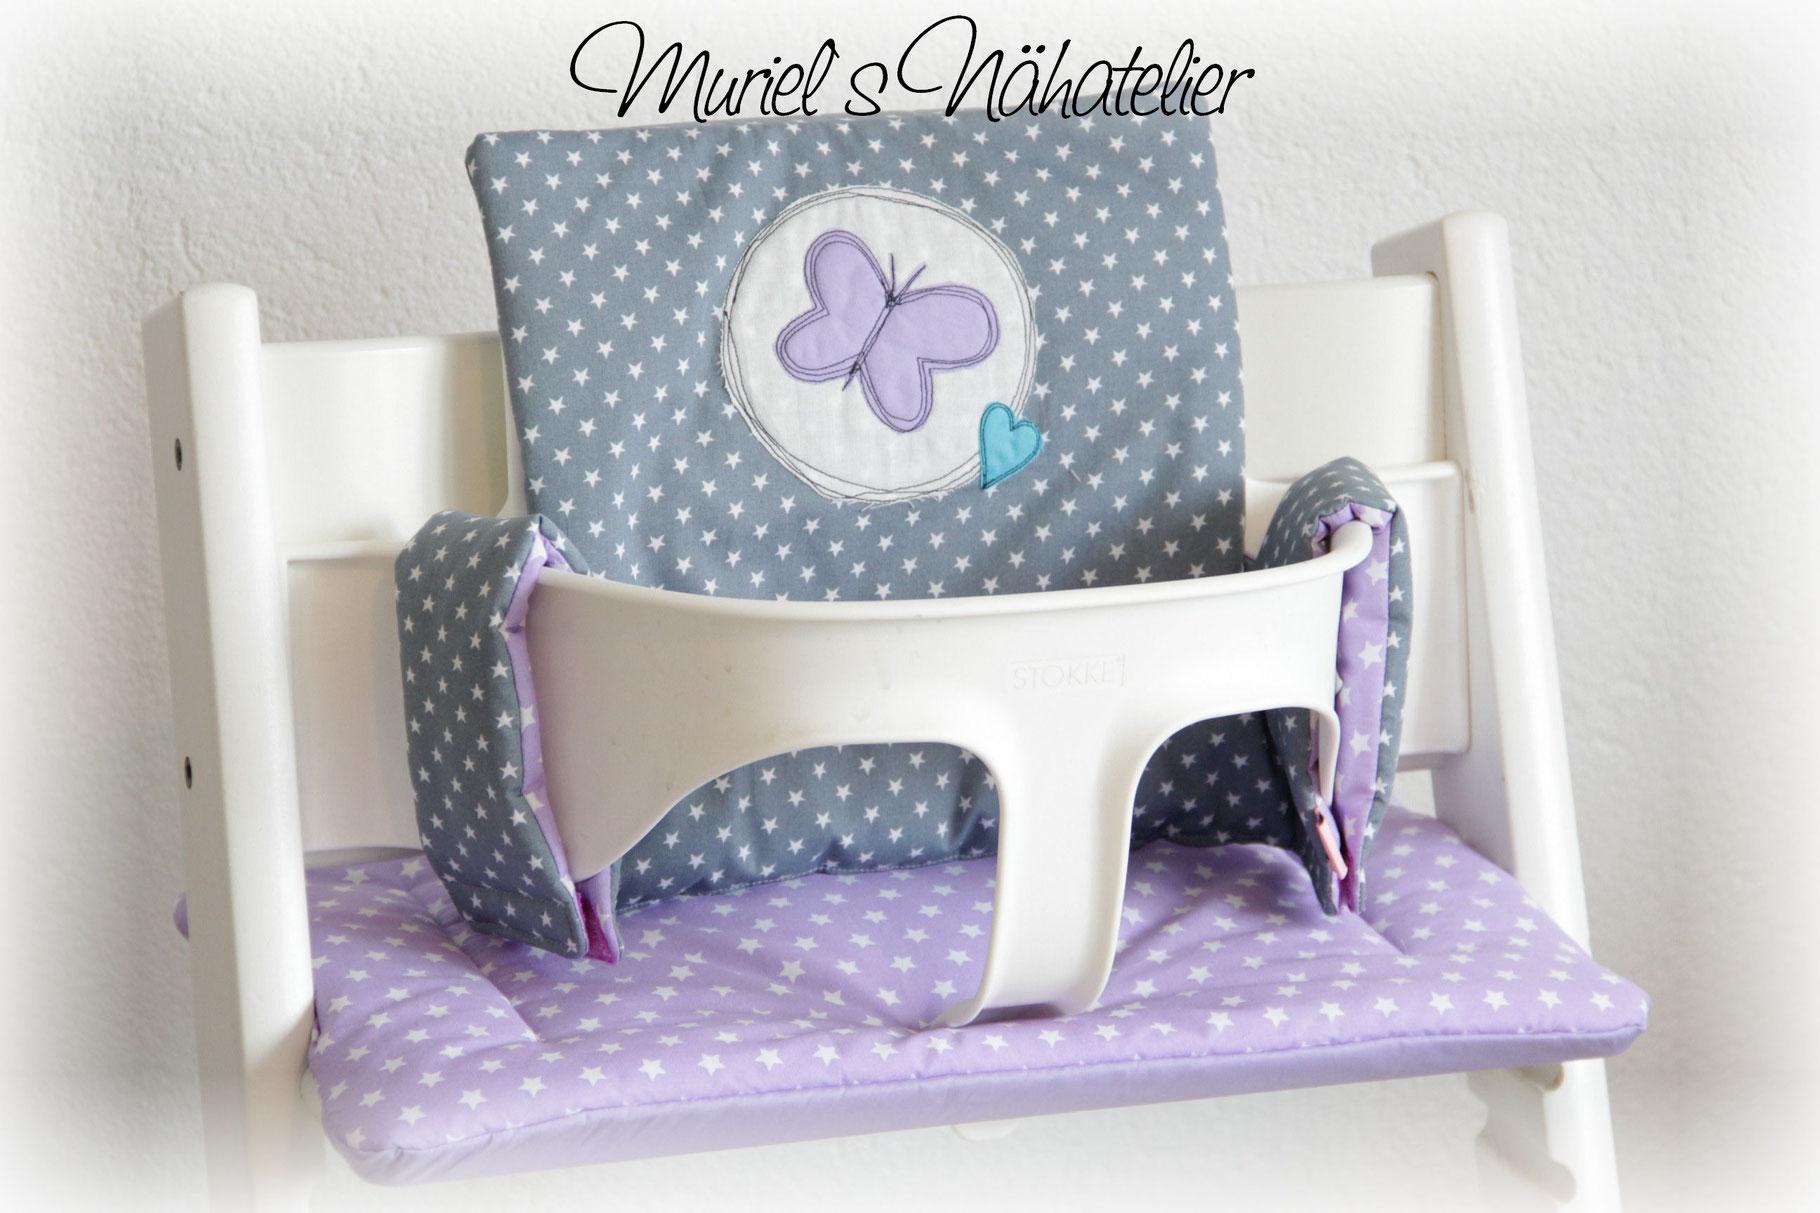 tripp trapp kissen muriels n hatelier. Black Bedroom Furniture Sets. Home Design Ideas